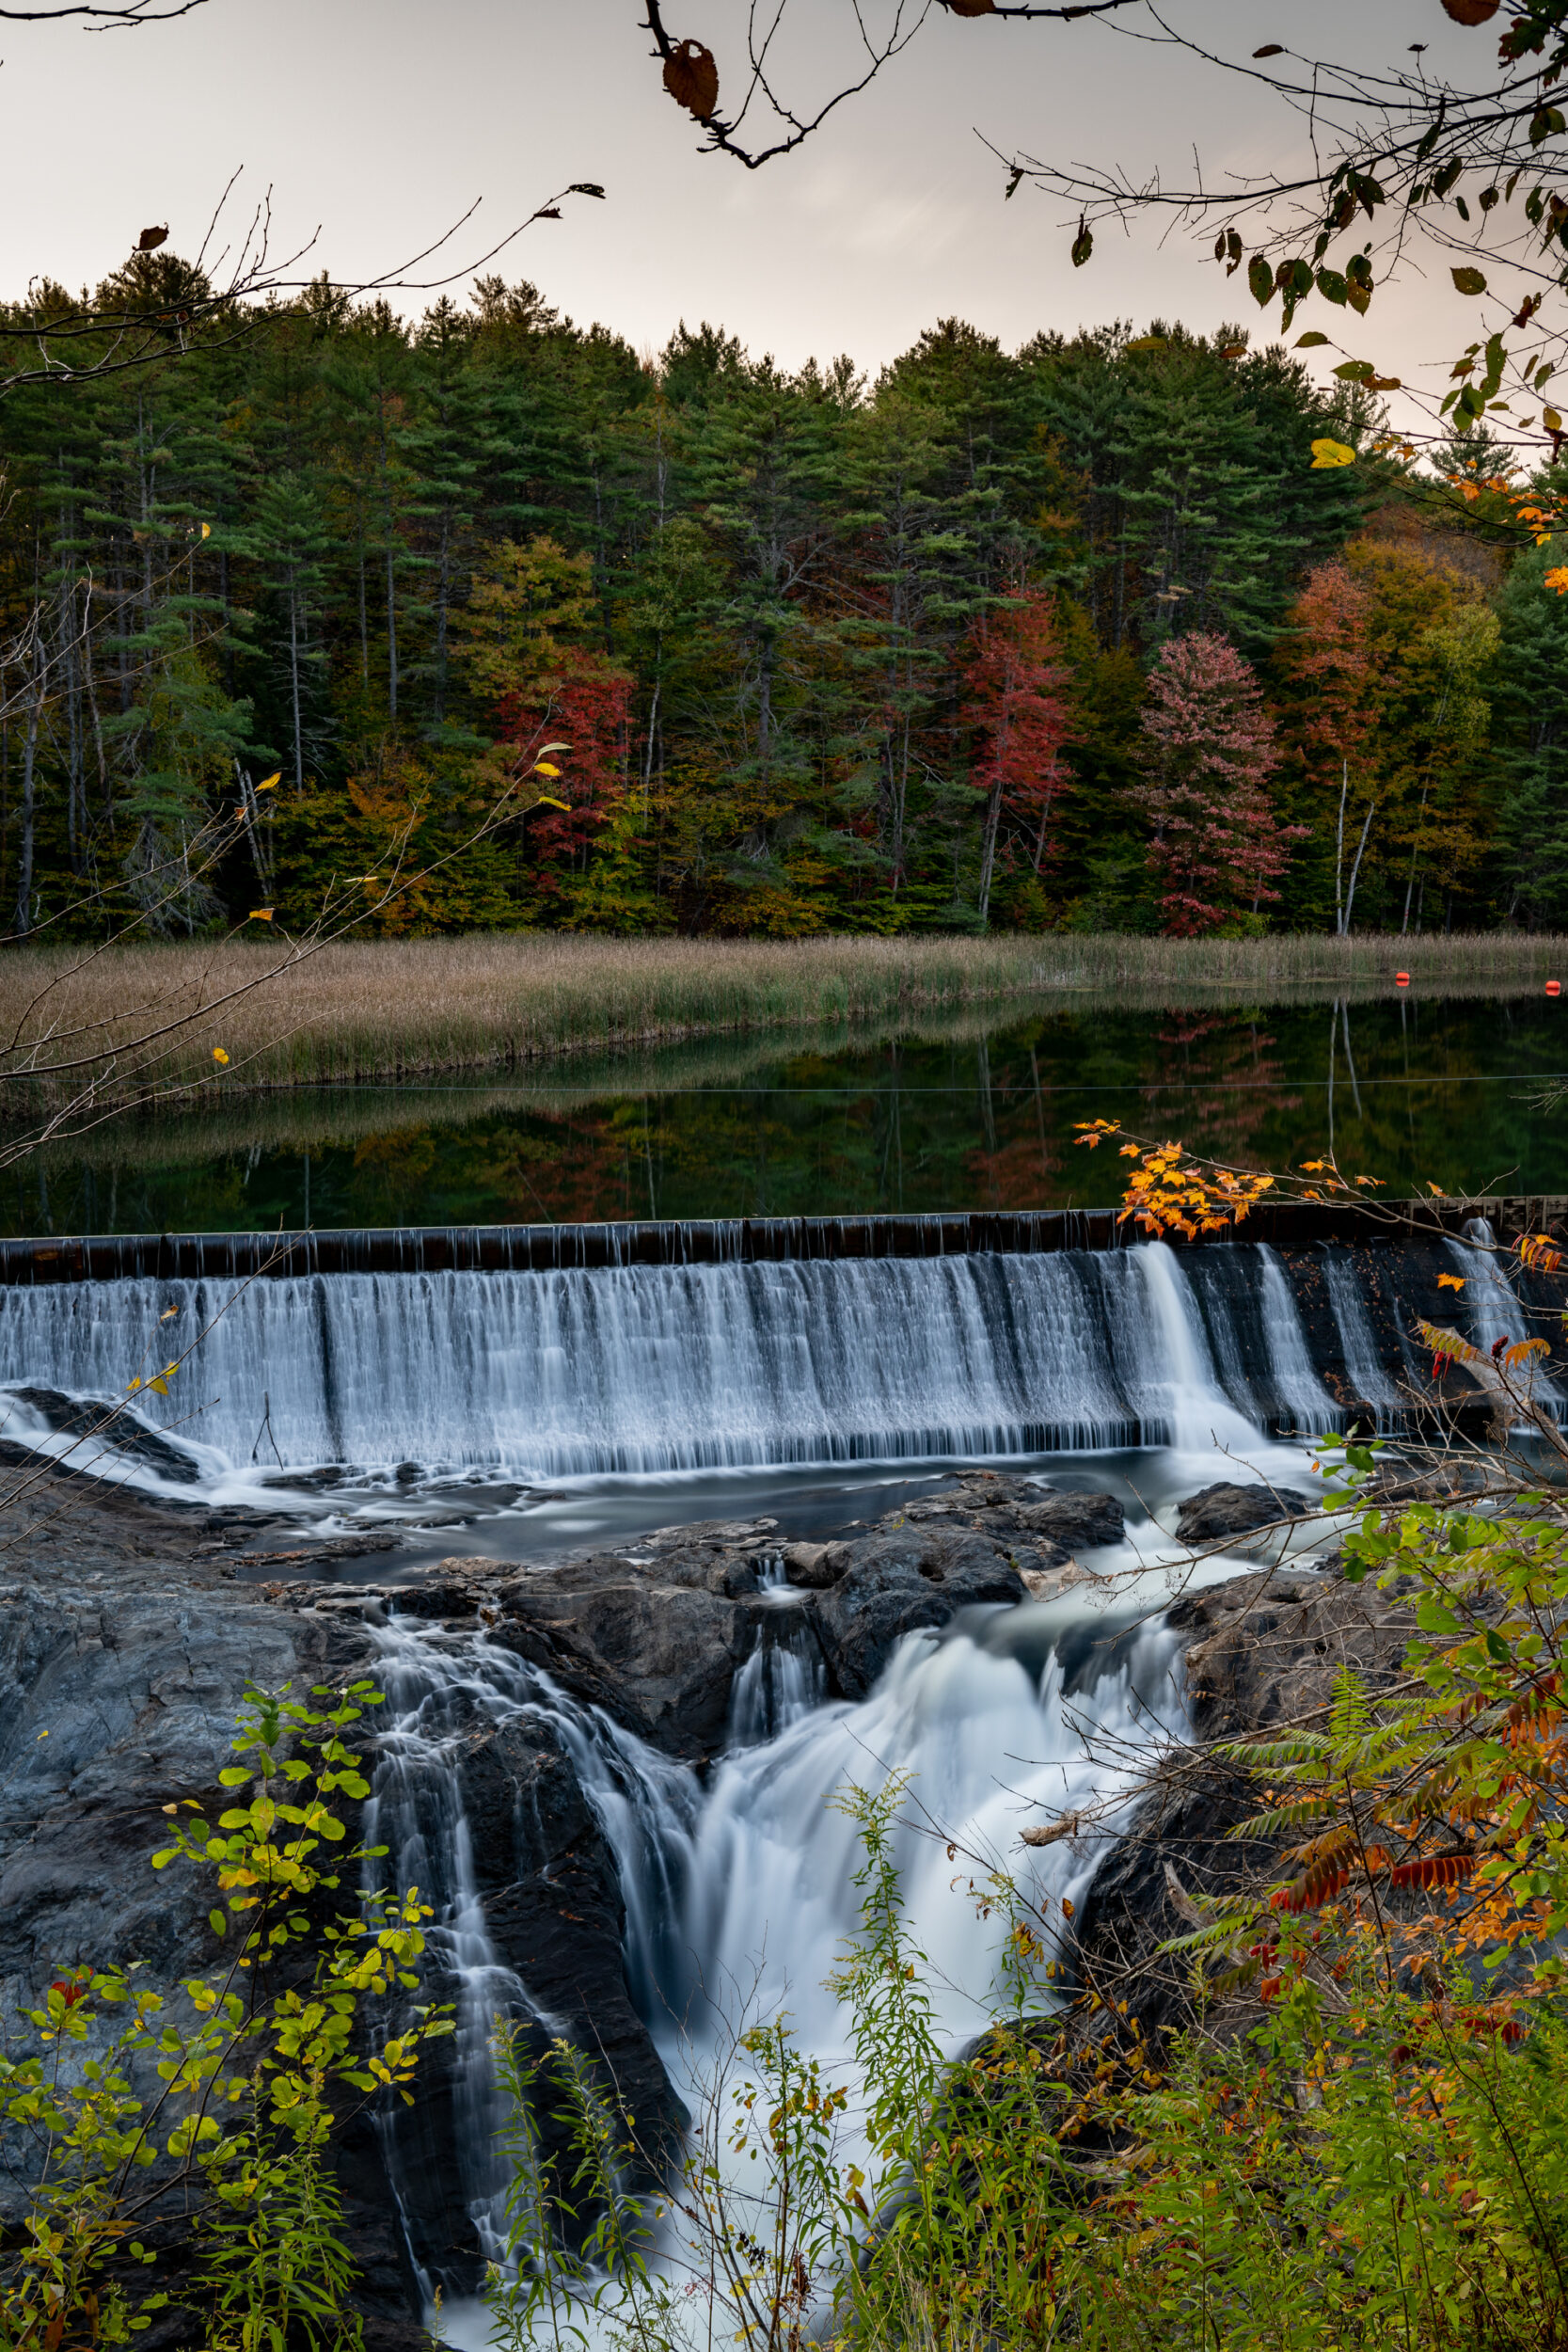 Quechee River Dam in Quechee, Vermont